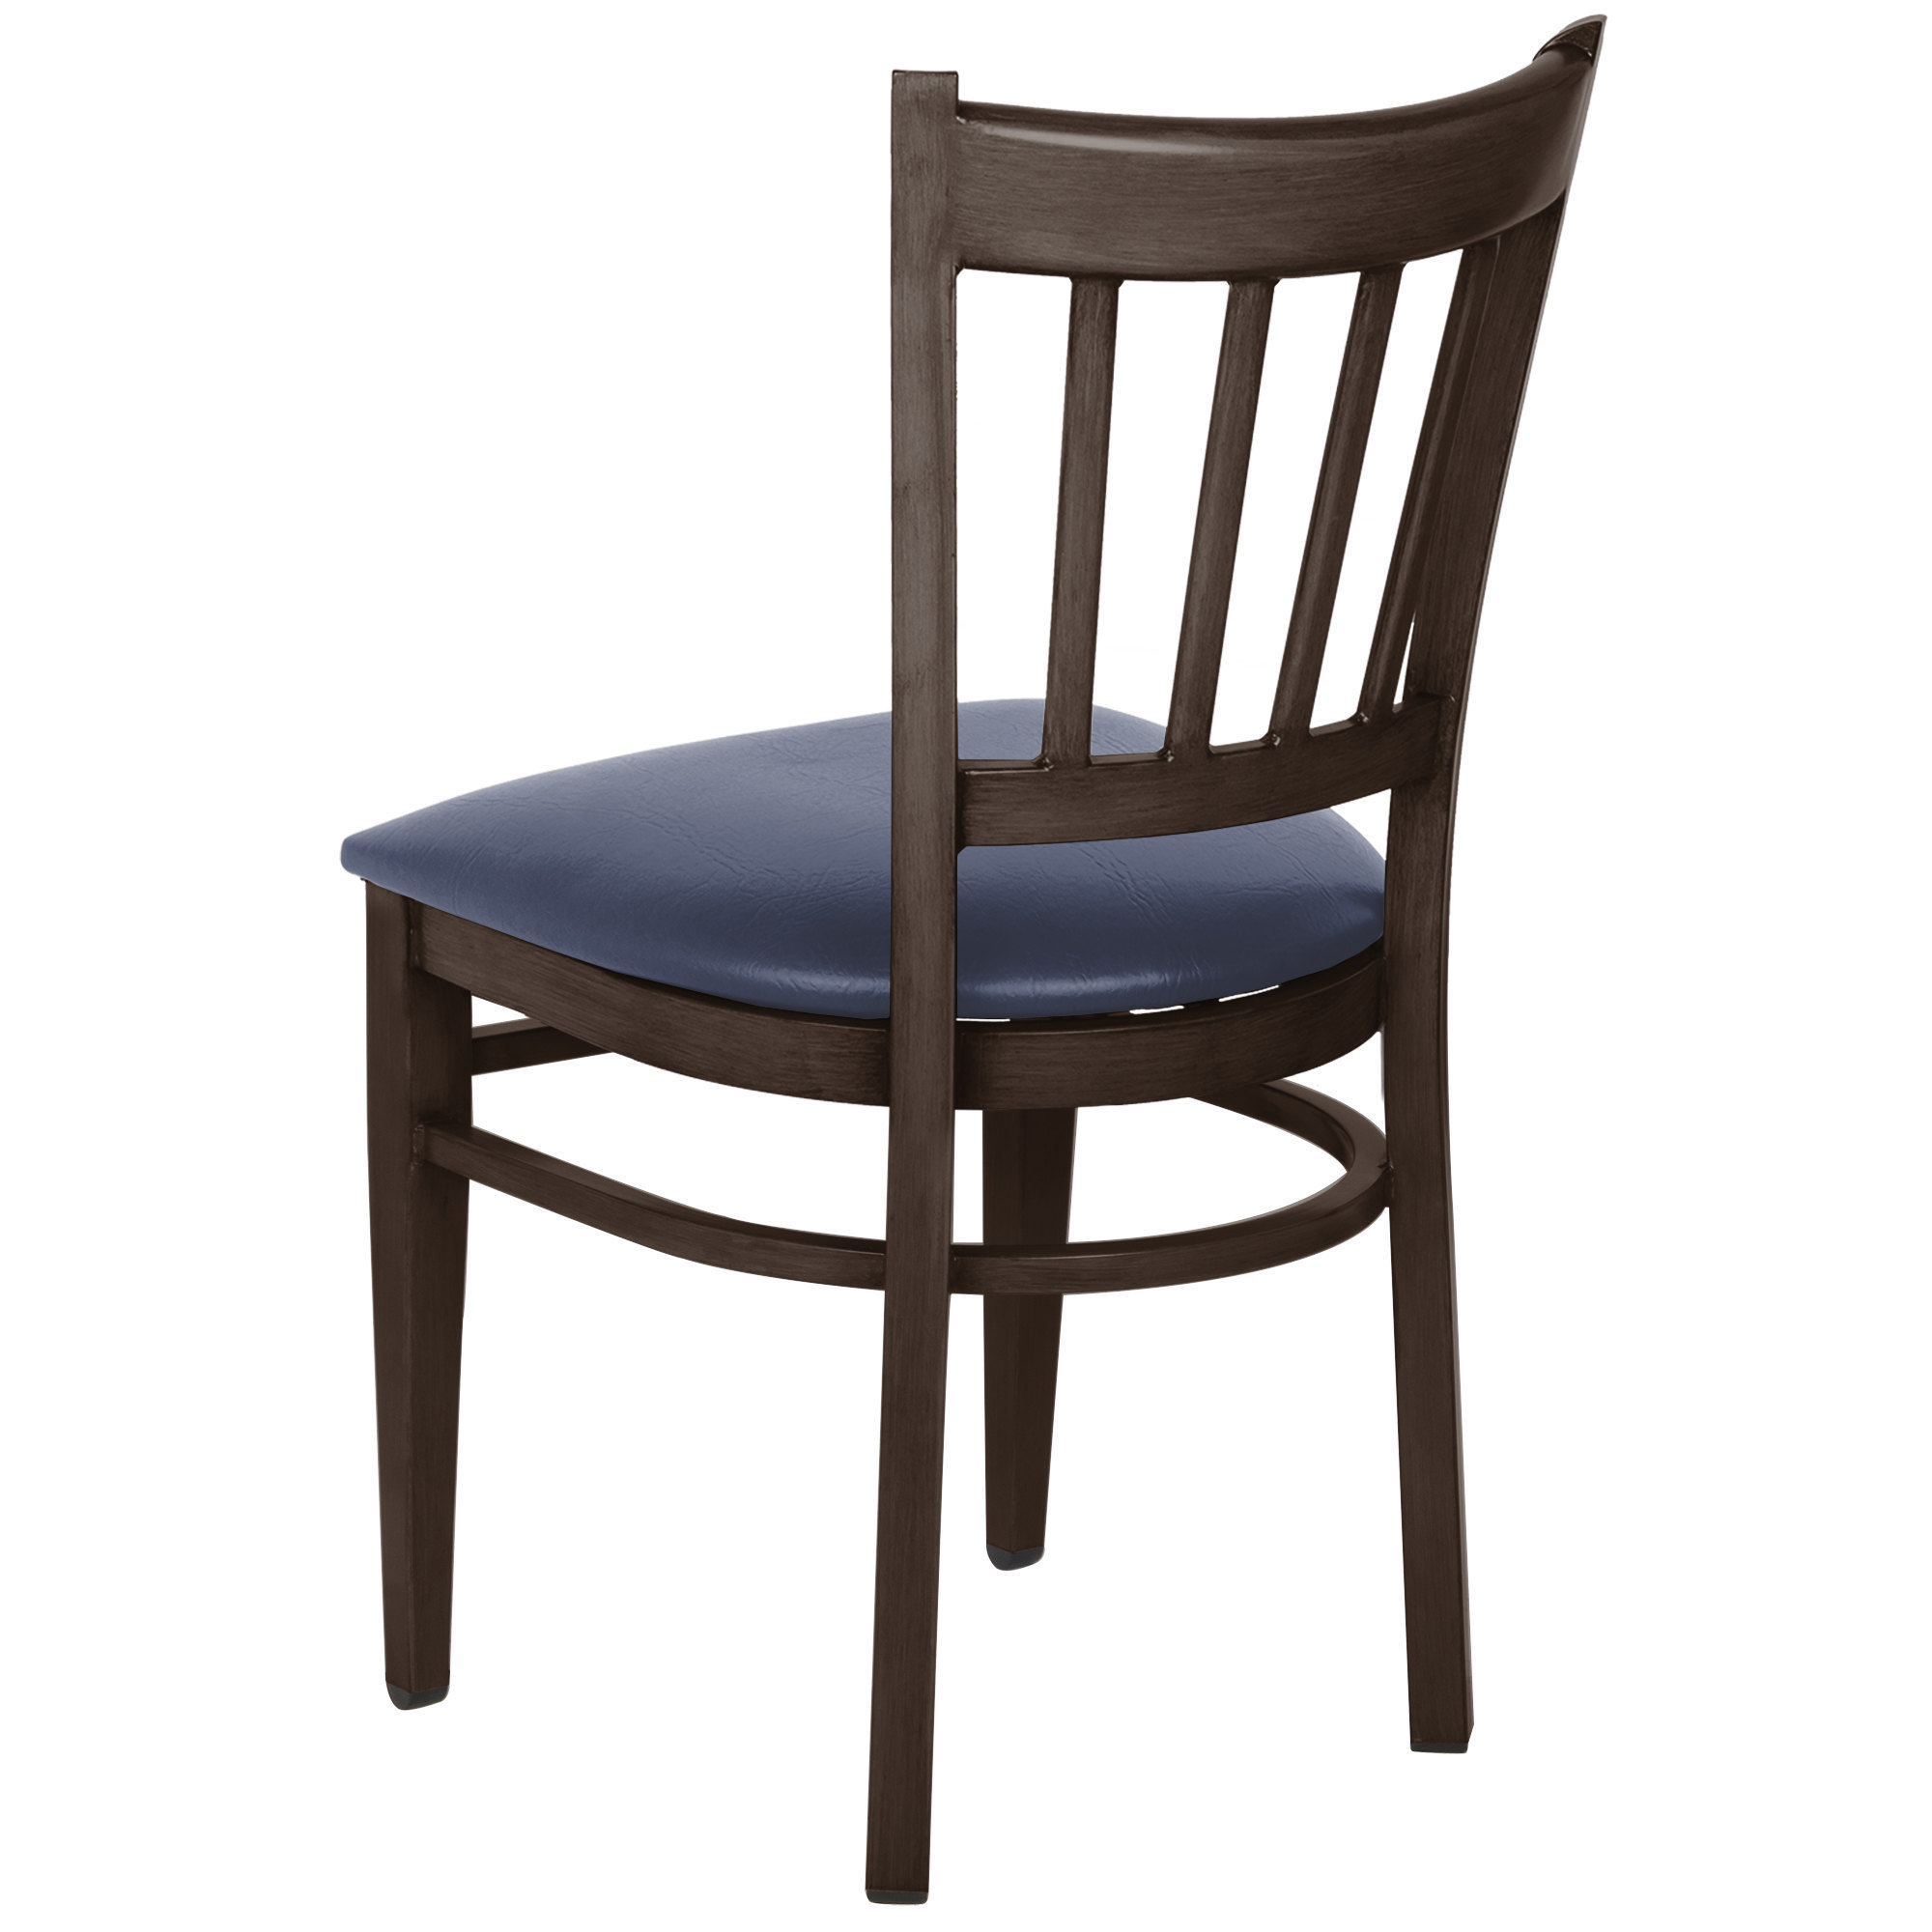 #139 - Slat Back Design Metal Restaurant Chair with Walnut Wood Grain Finish and Navy Vinyl Seat